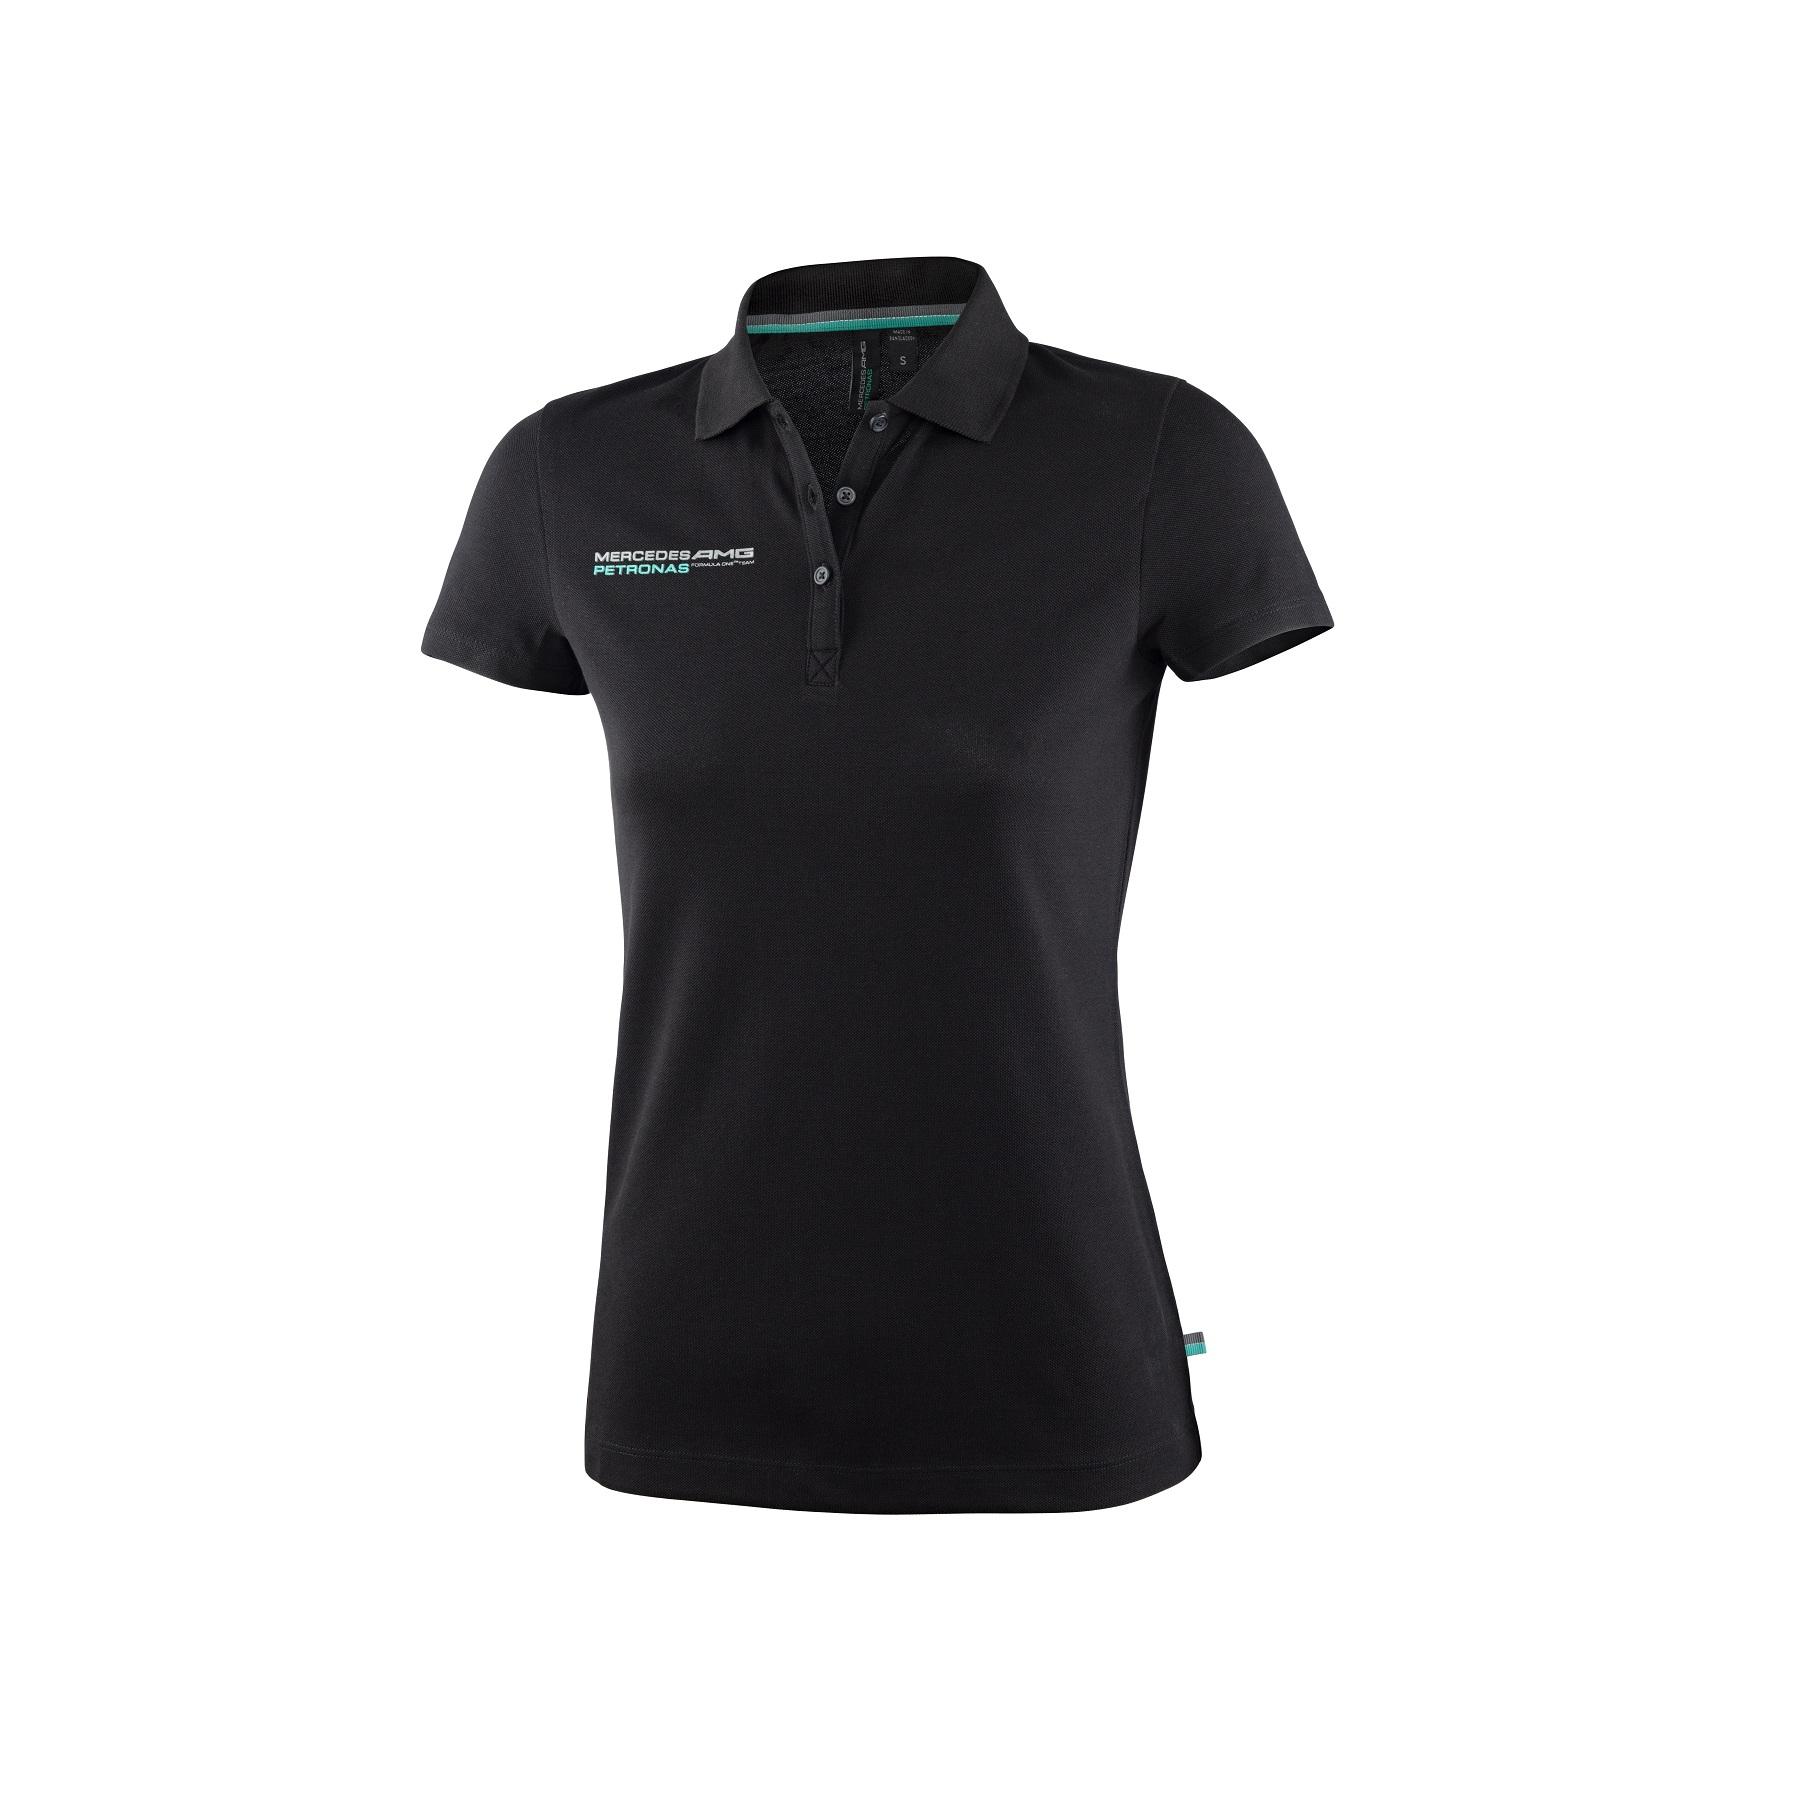 sale mercedes amg formula 1 f1 team ladies slim fit polo shirt black womens ebay. Black Bedroom Furniture Sets. Home Design Ideas